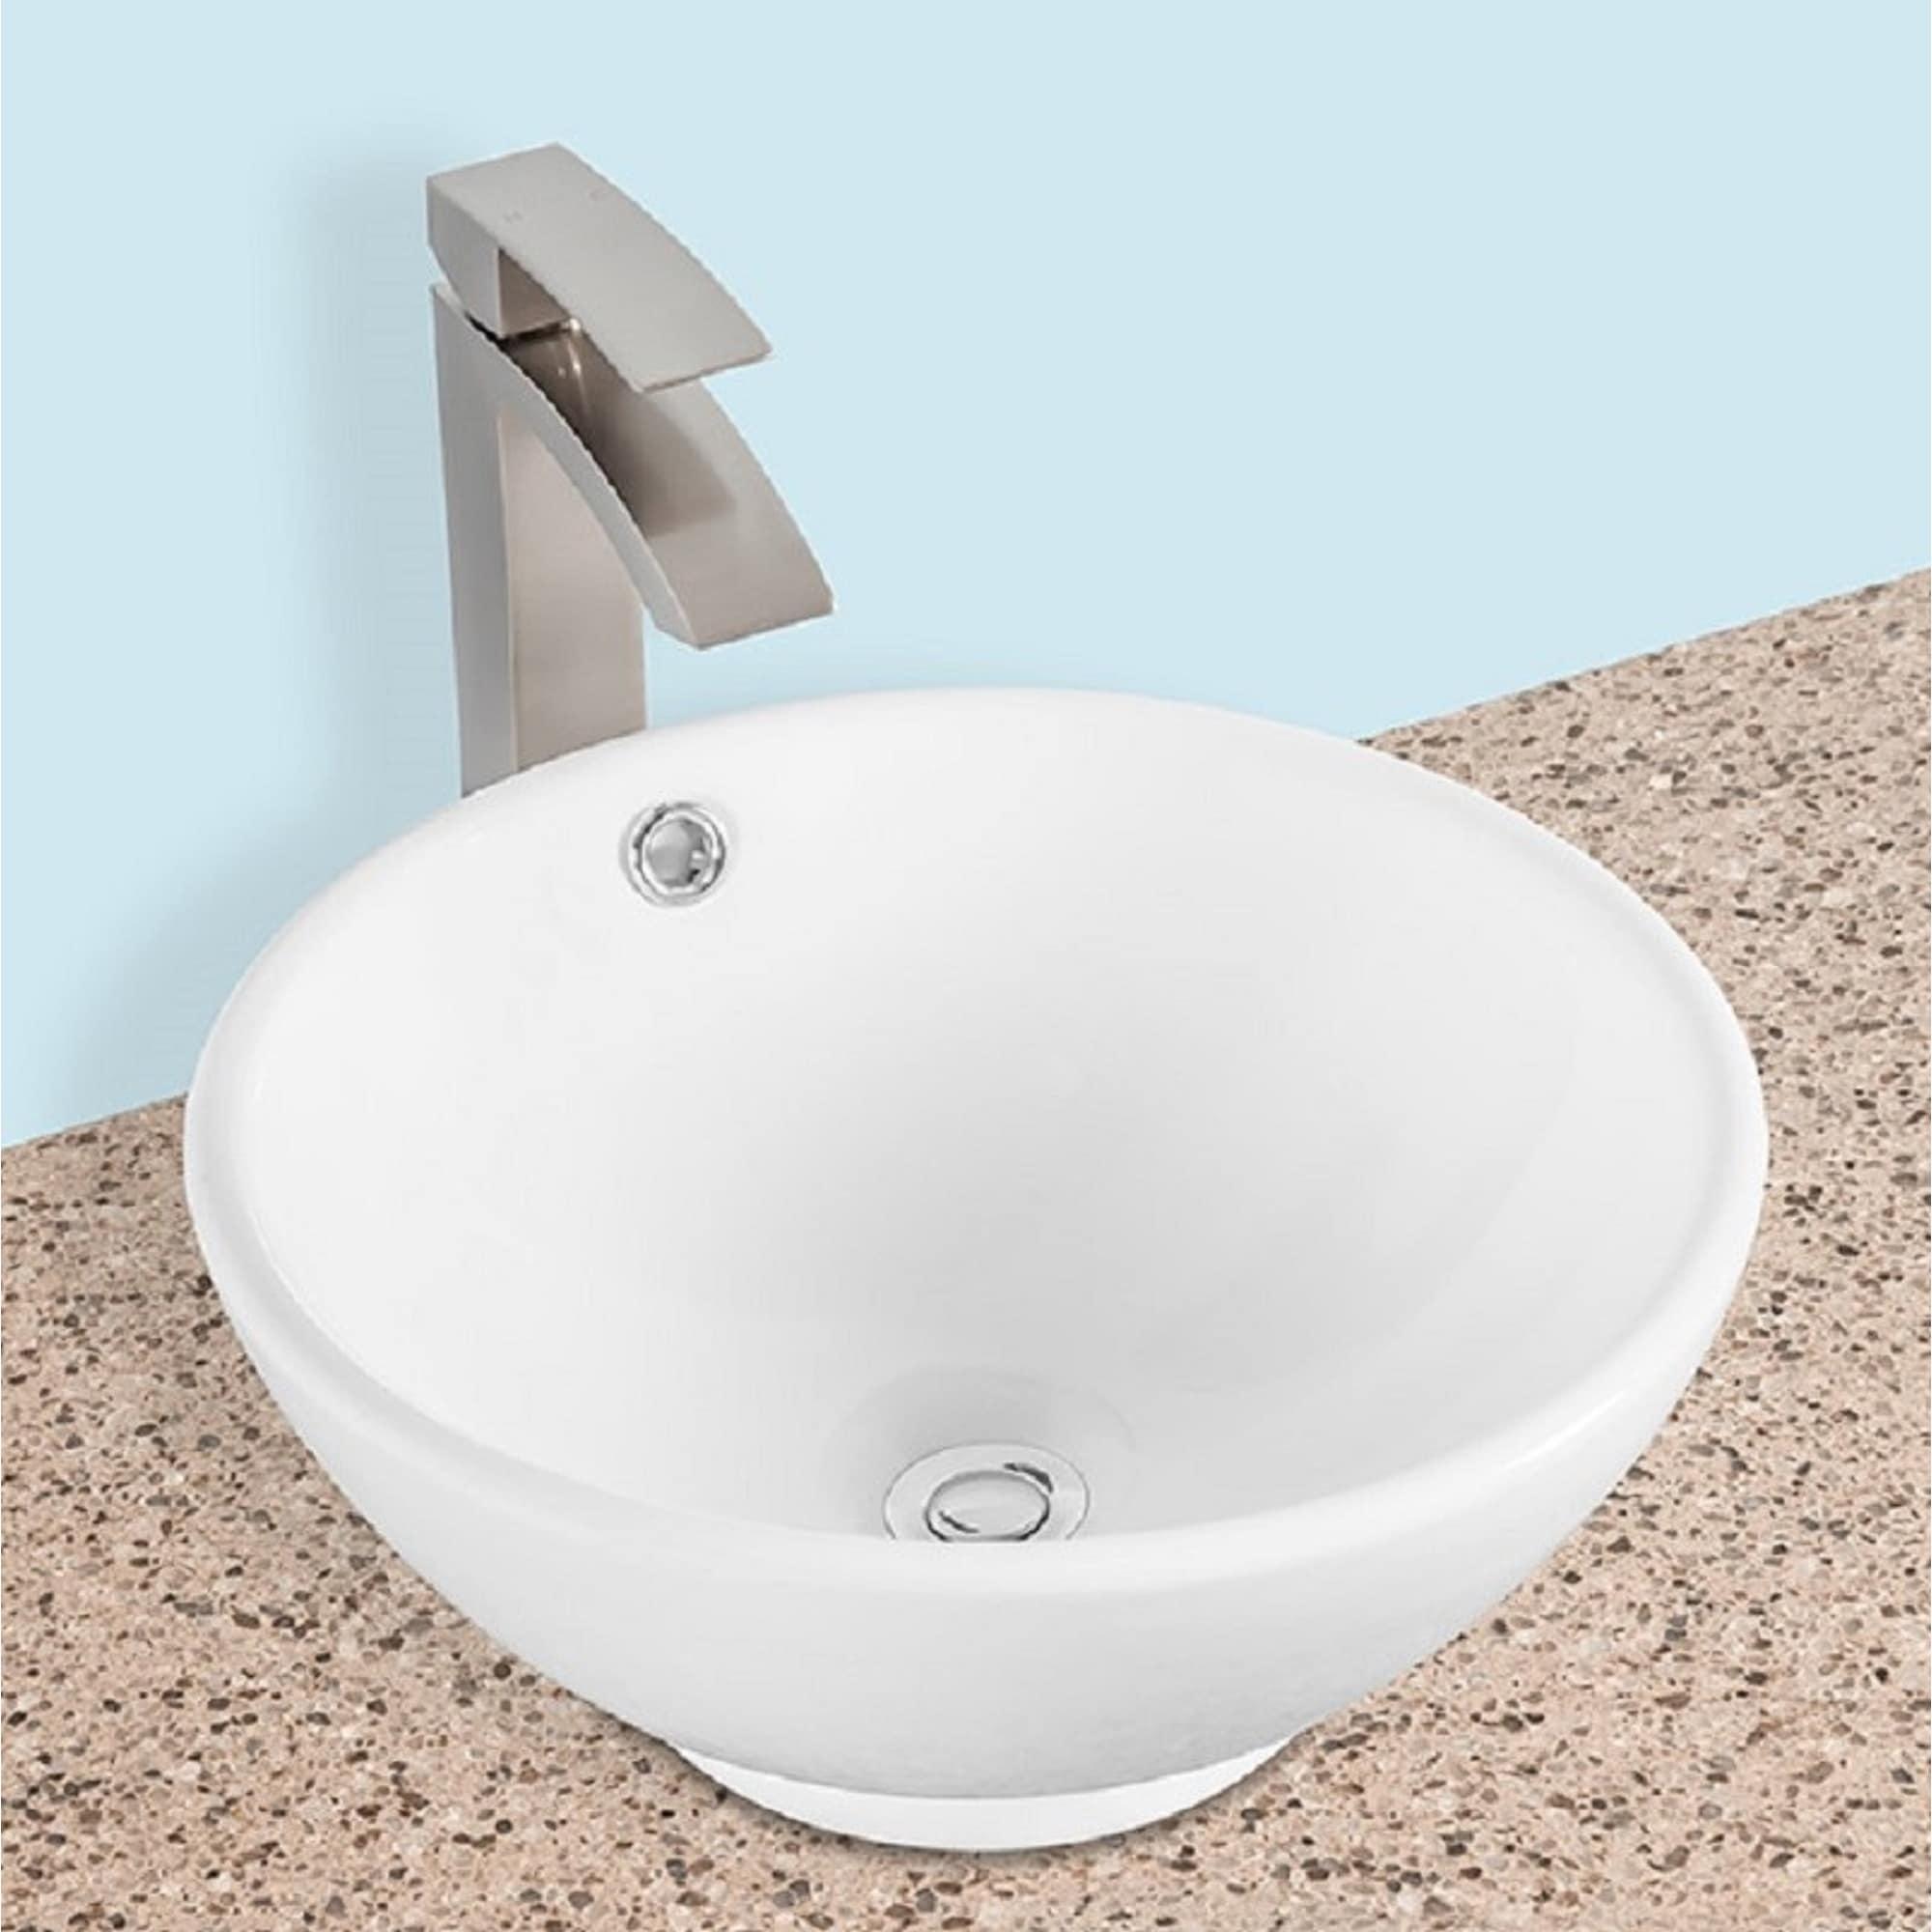 Ajello V416 16 Inch Round Above The Counter Ceramic Bathroom Vanity Vessle Sink Modern Style Counter Top Vanity Art Basin Bowl Overstock 32027134